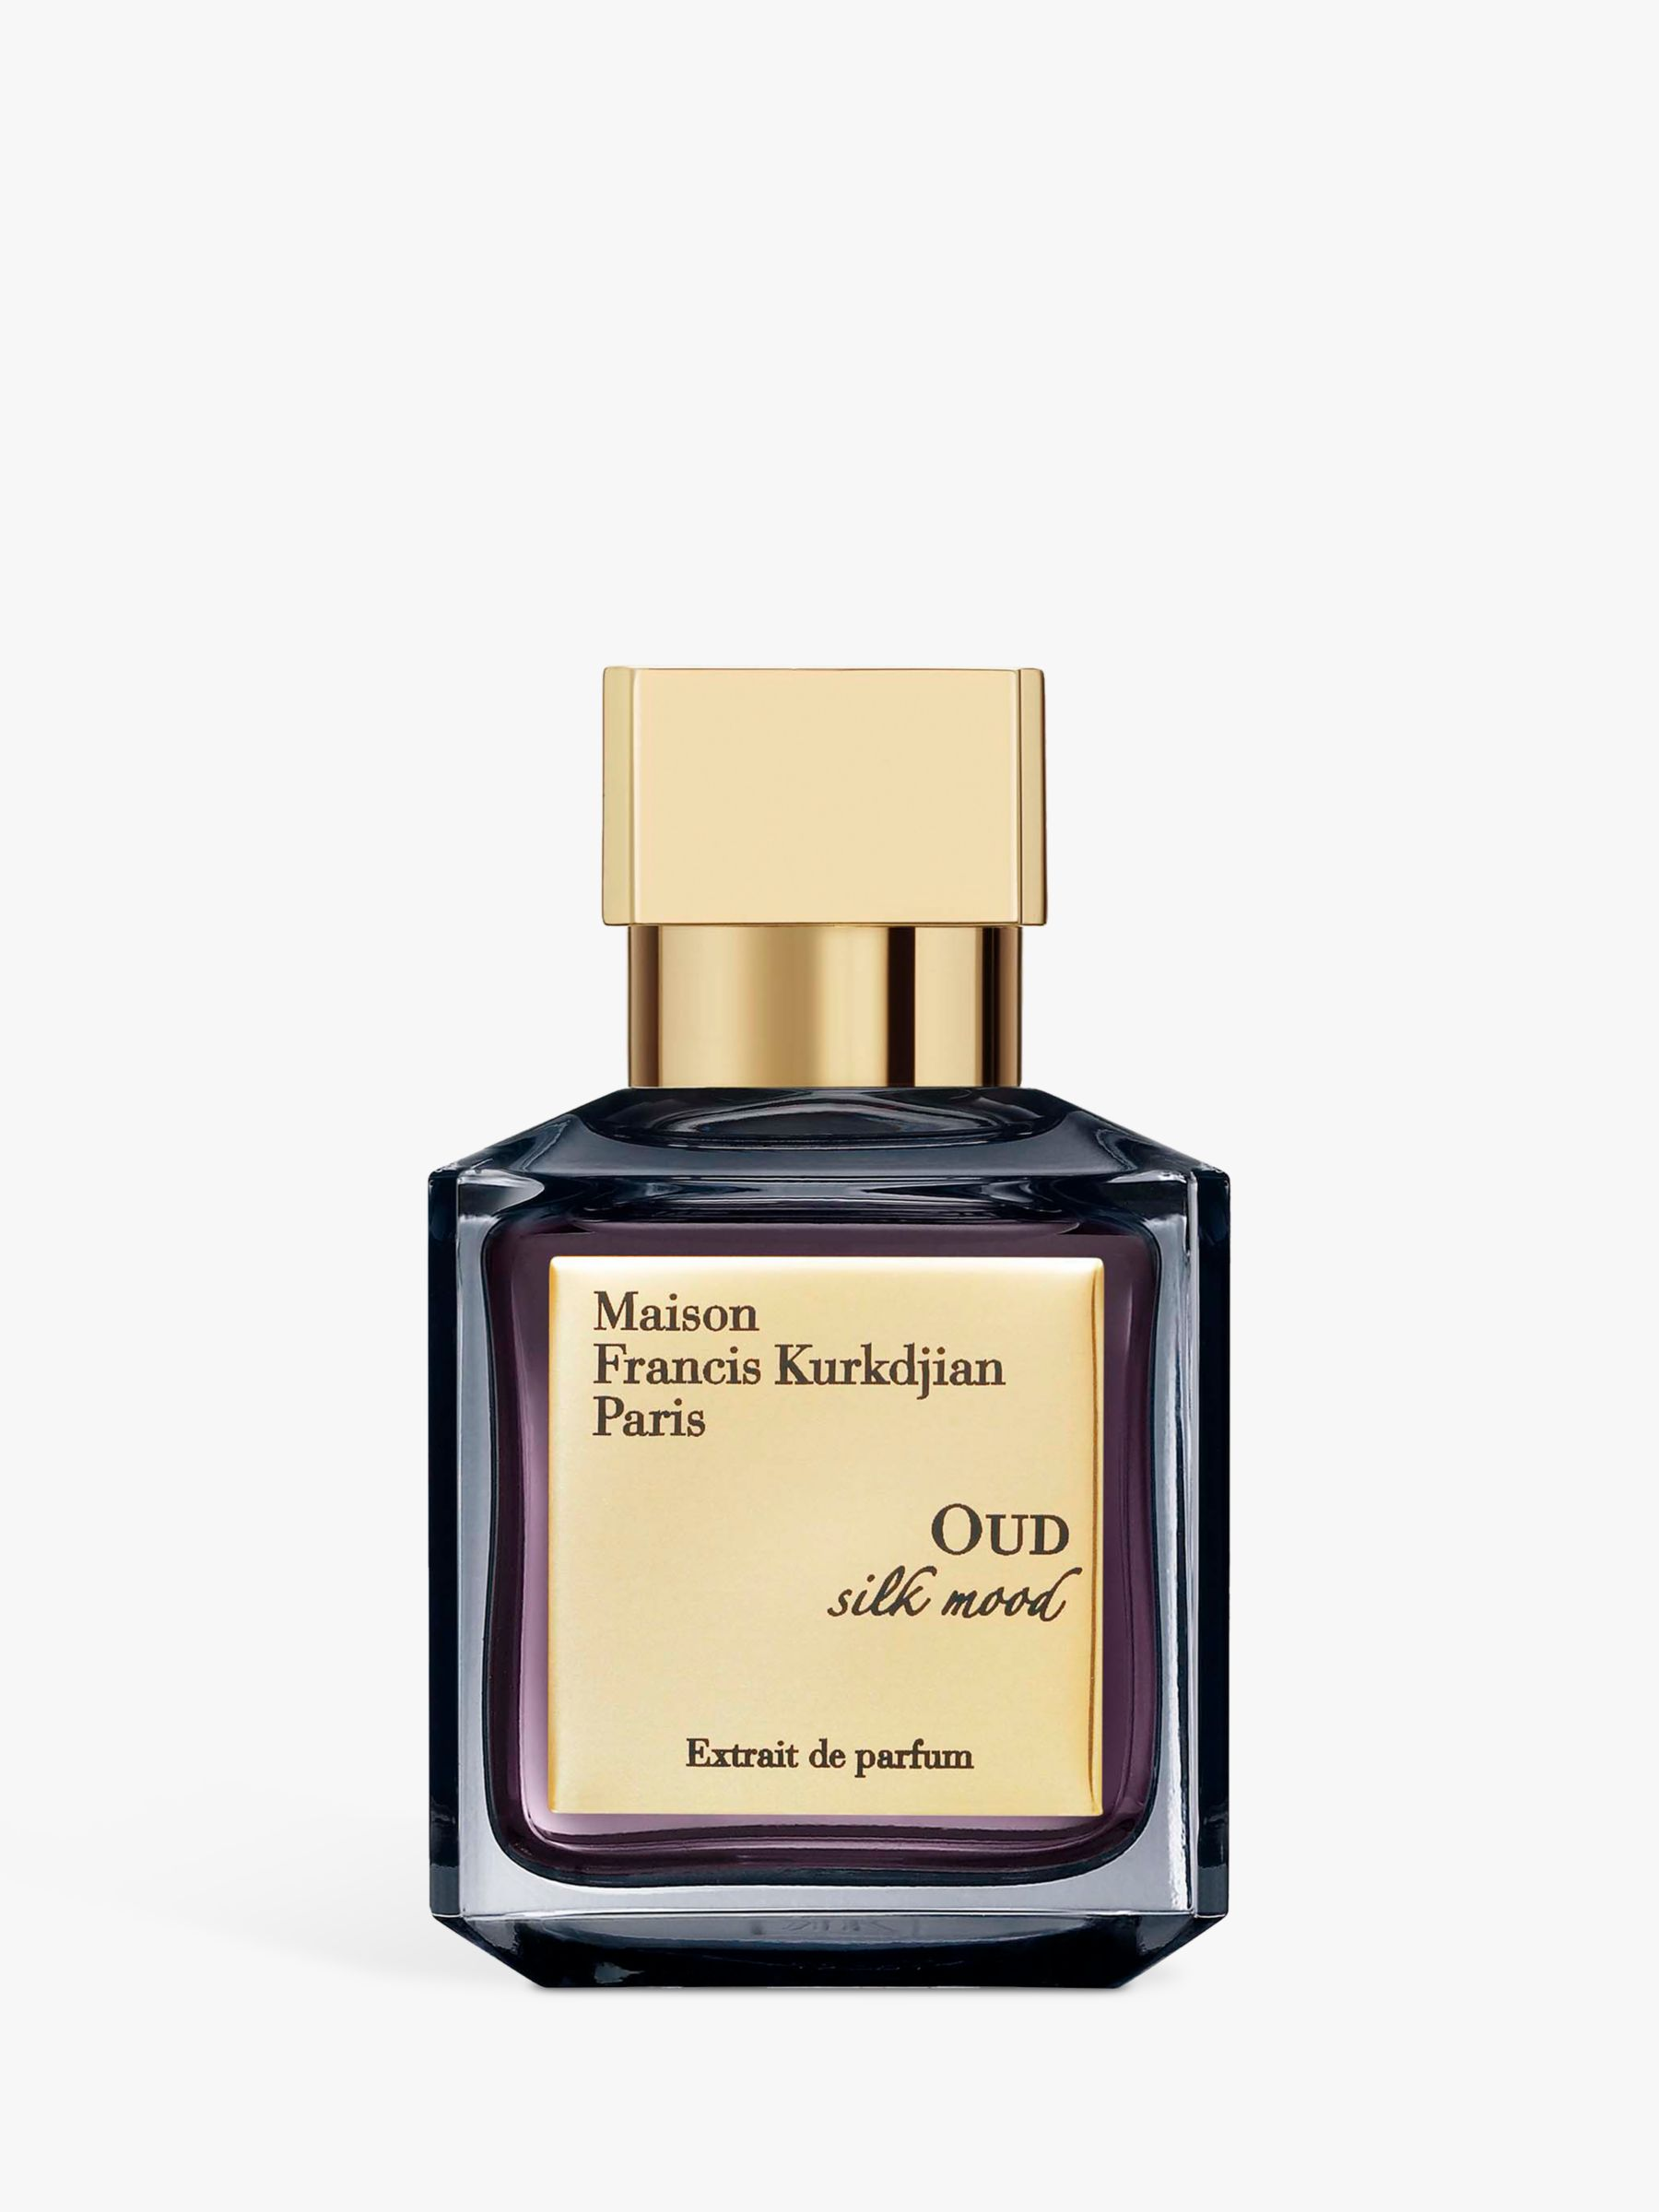 Maison Francis Kurkdjian Maison Francis Kurkdjian Oud Silk Mood Extrait de Parfum, 70ml